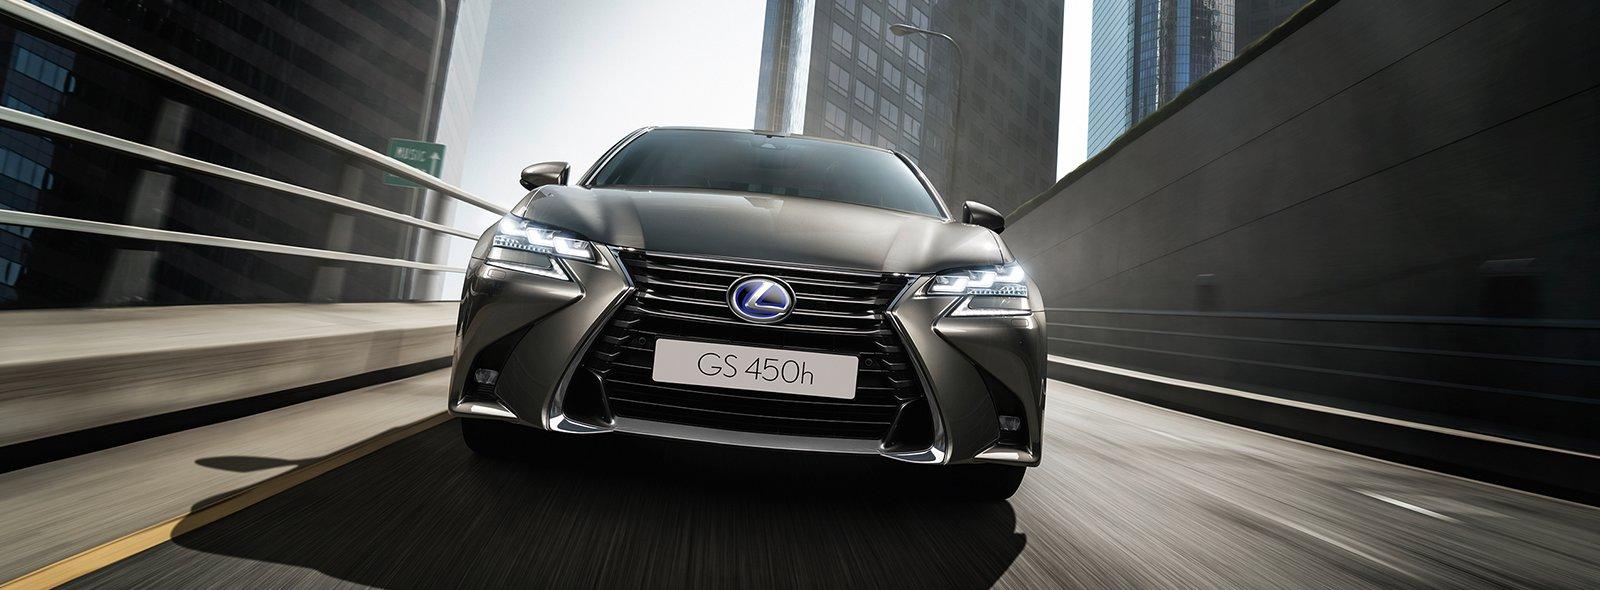 La berlina GS Hybrid 450h sonic titanium su una strada urbana